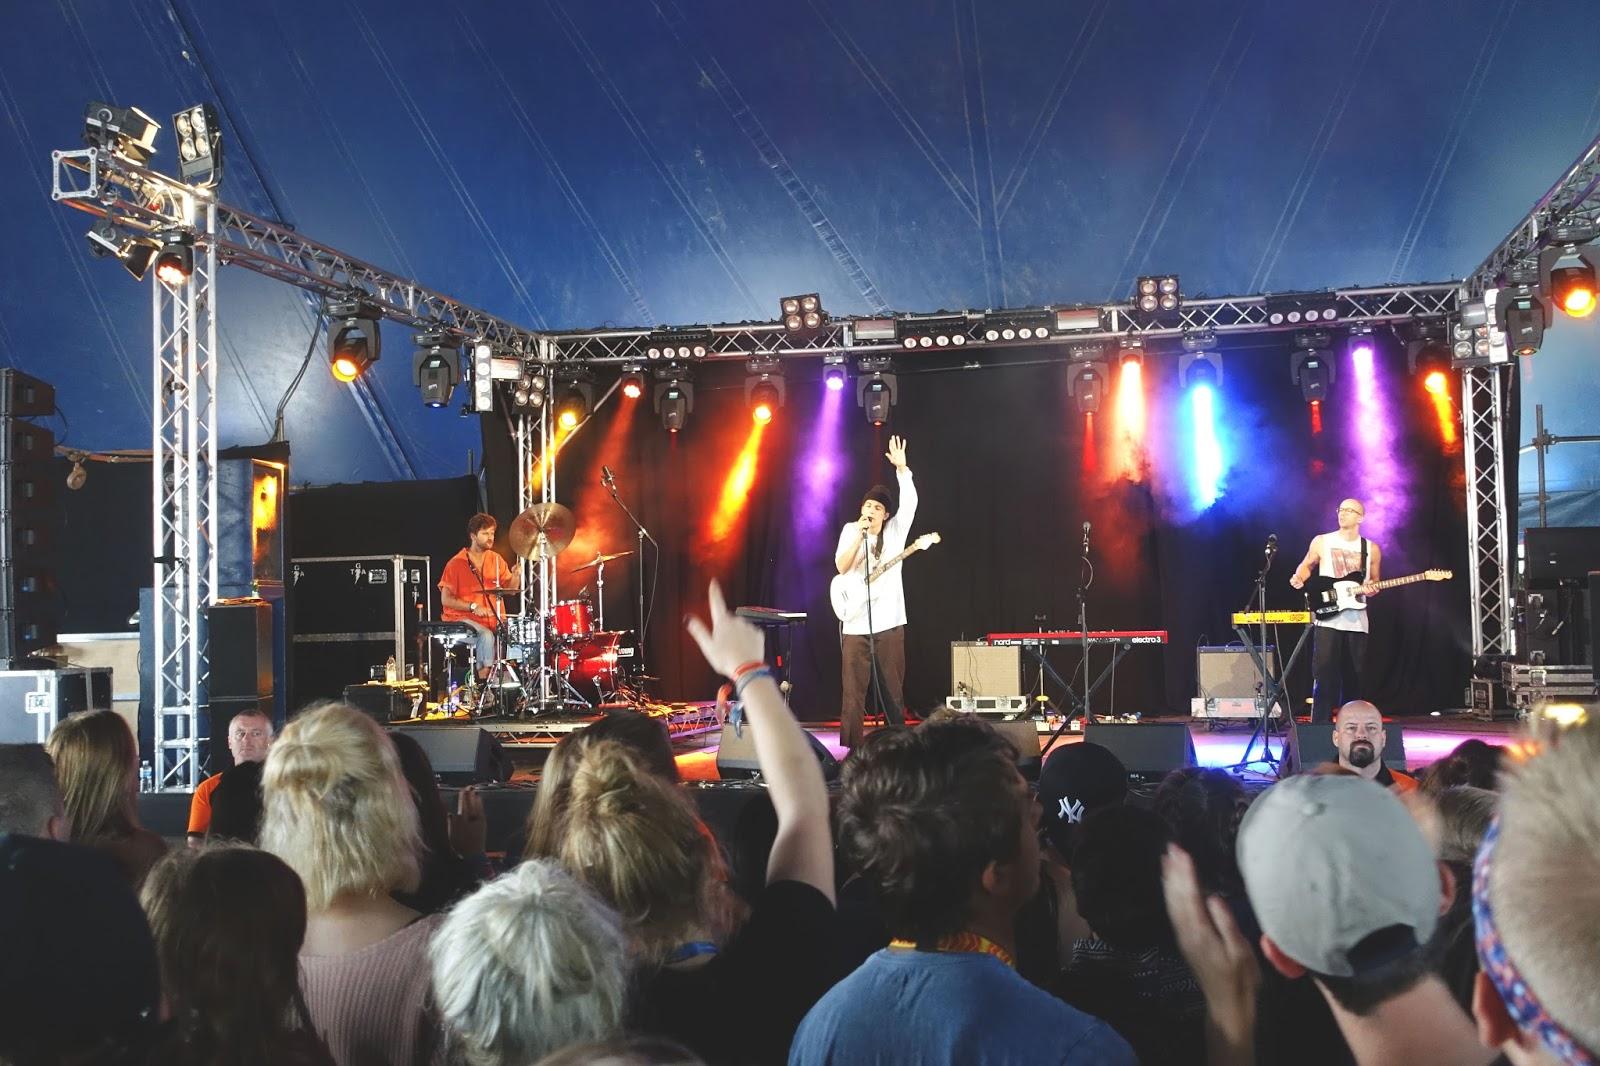 leeds festival - photo #32